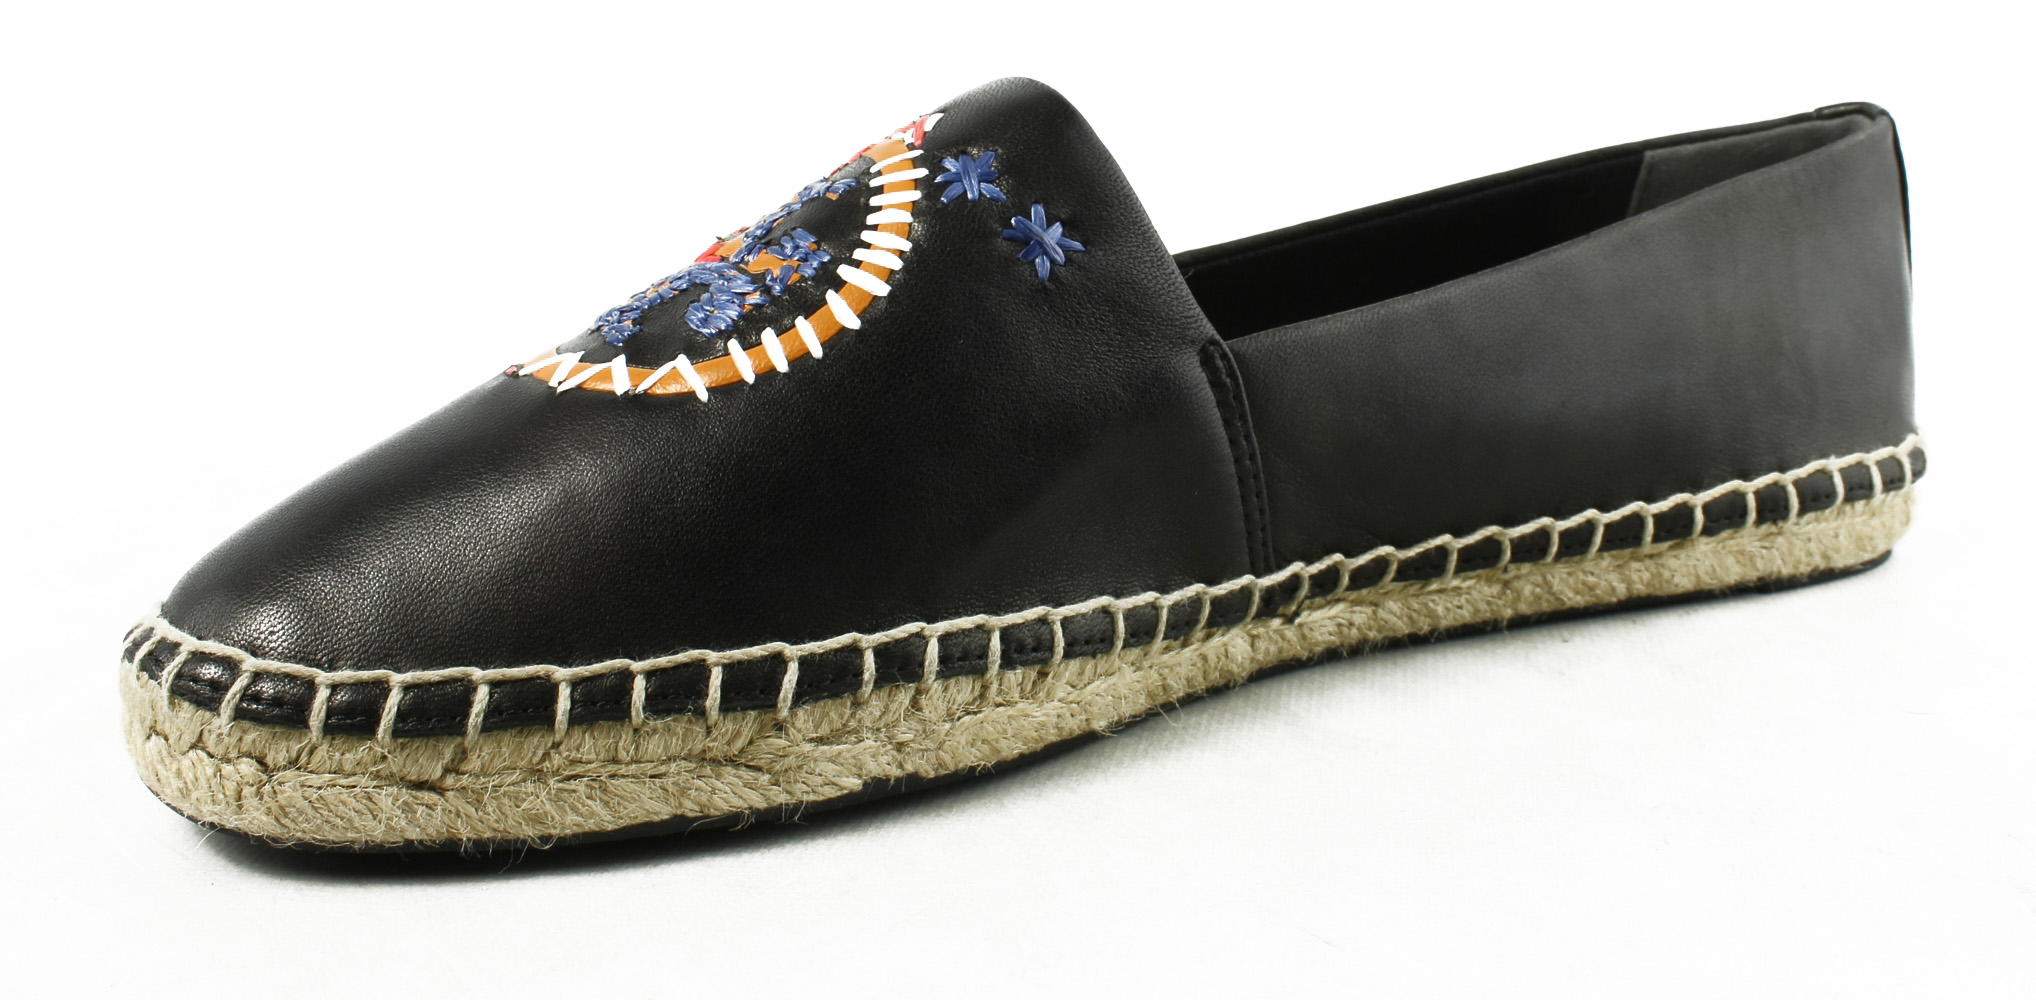 Tory Burch Womens  Black Espadrille Flats Size 9.5 New